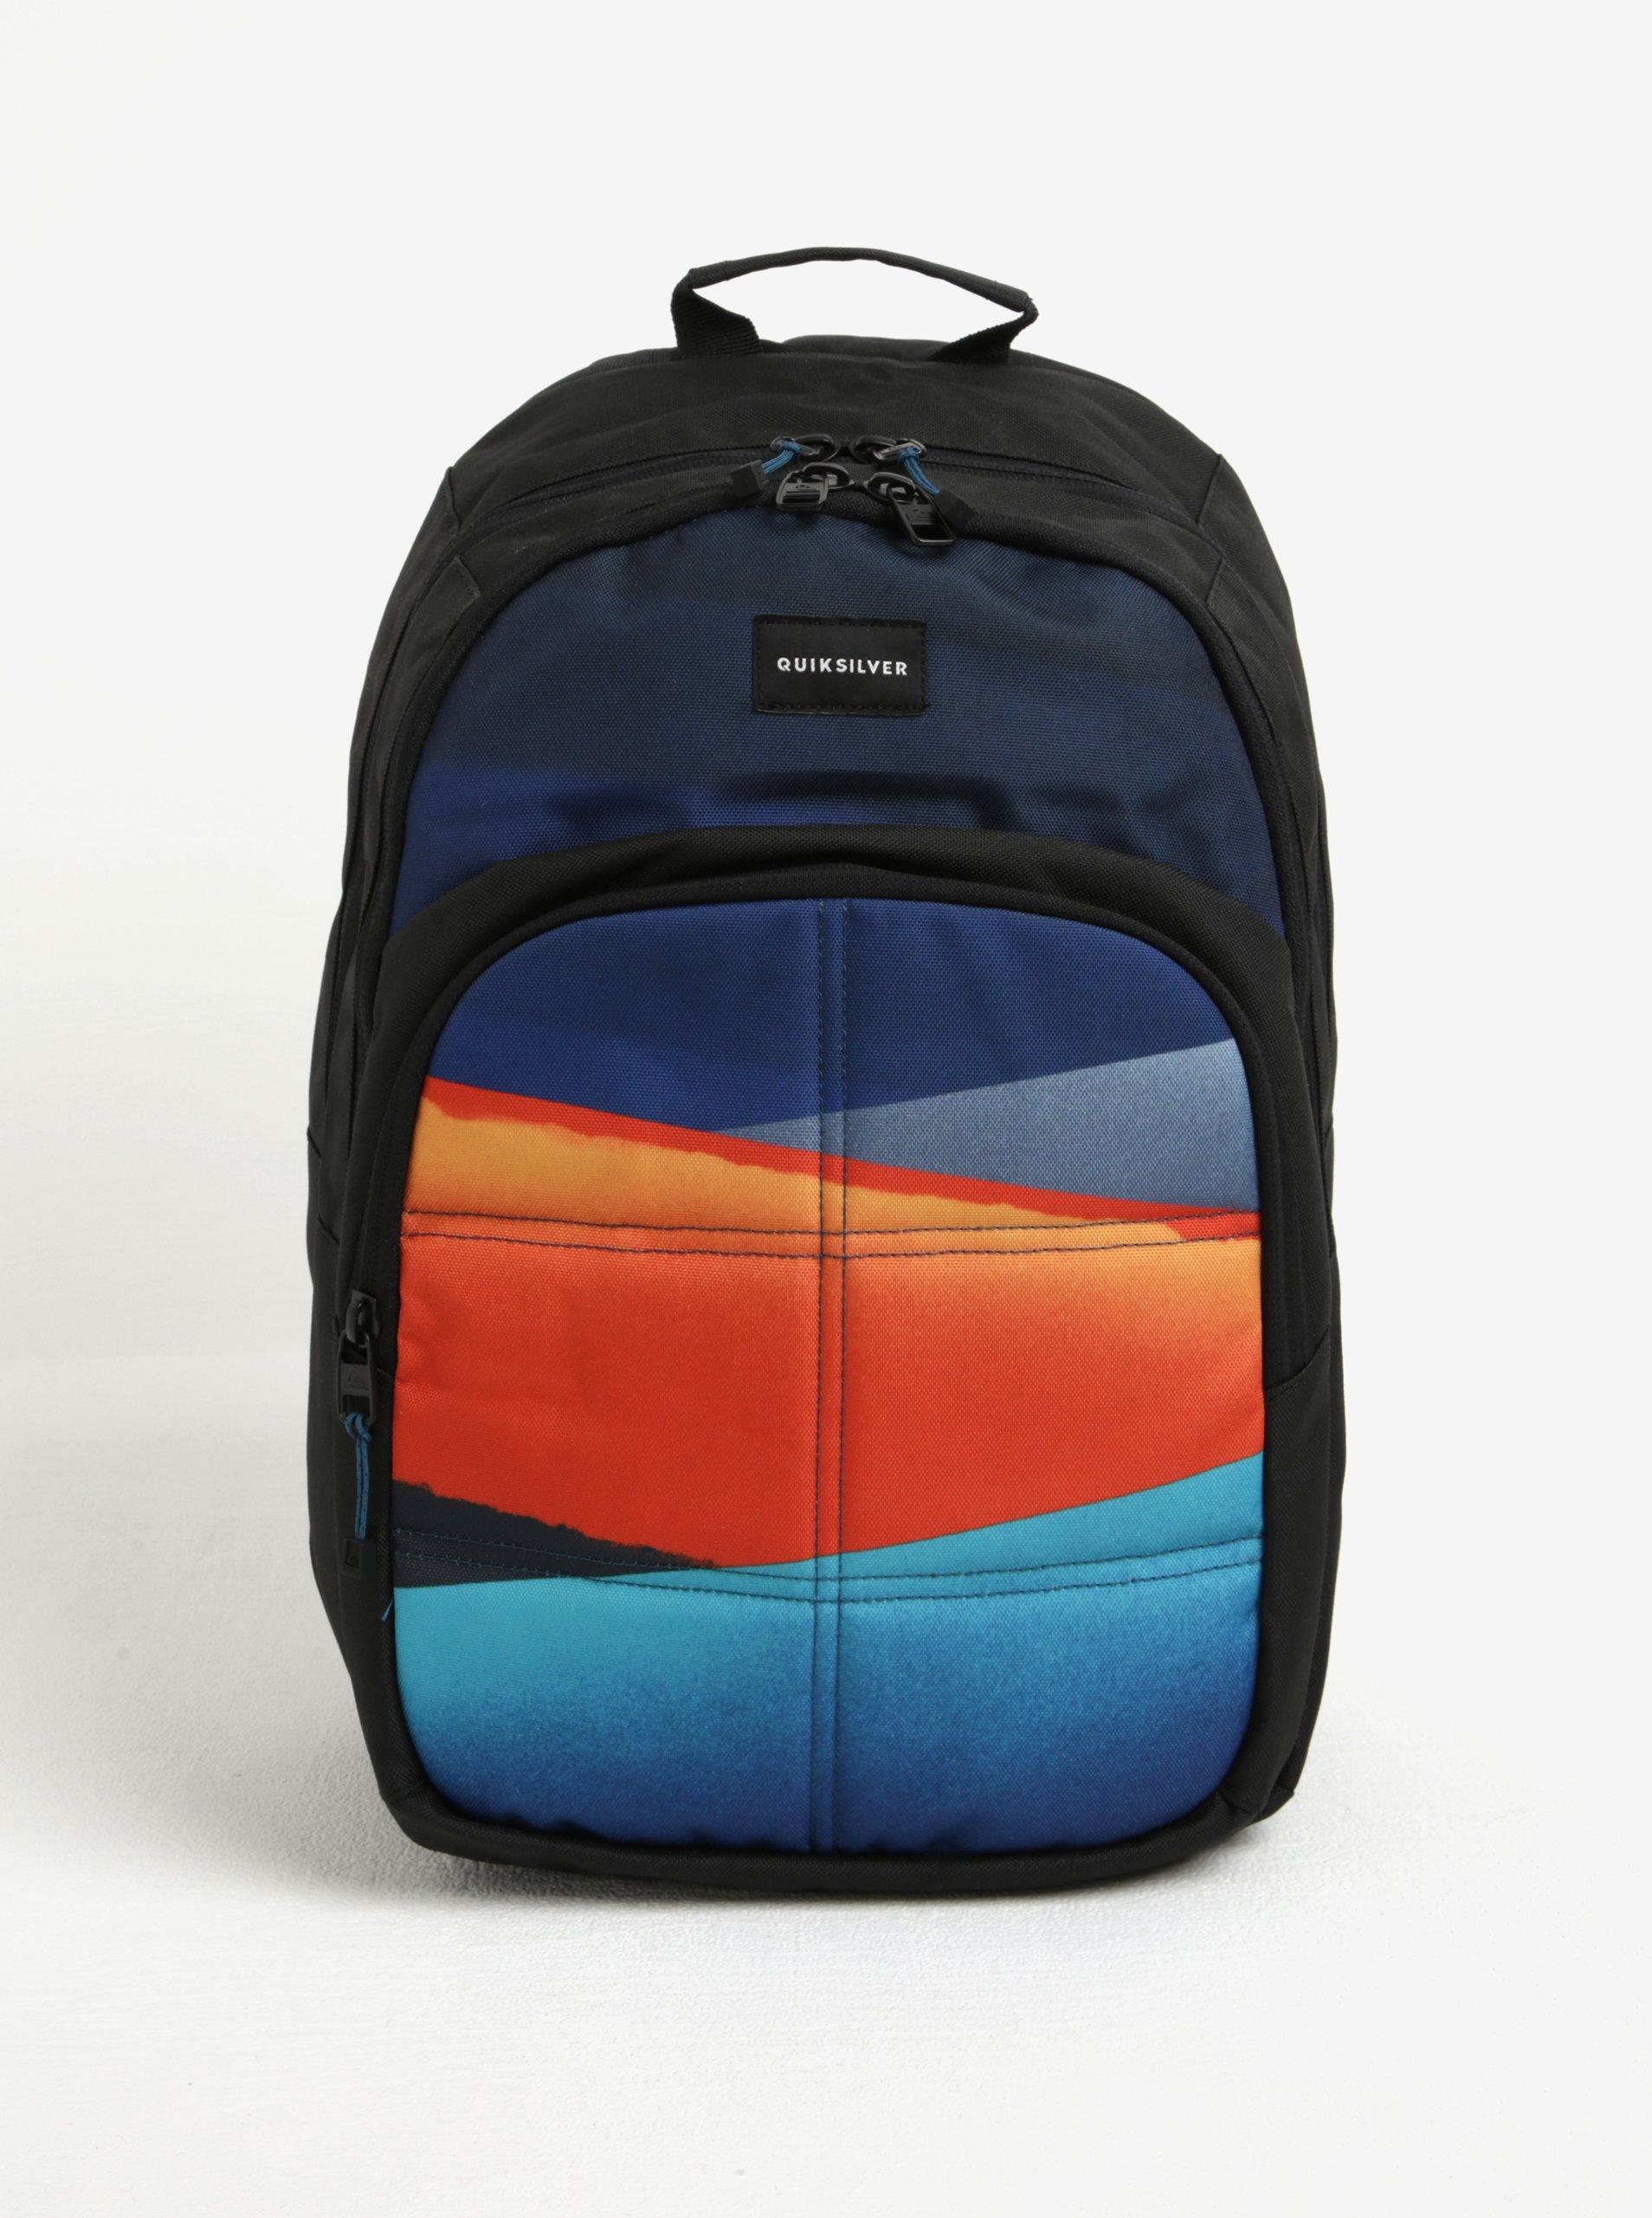 Modro-černý pánský batoh Quiksilver 20l